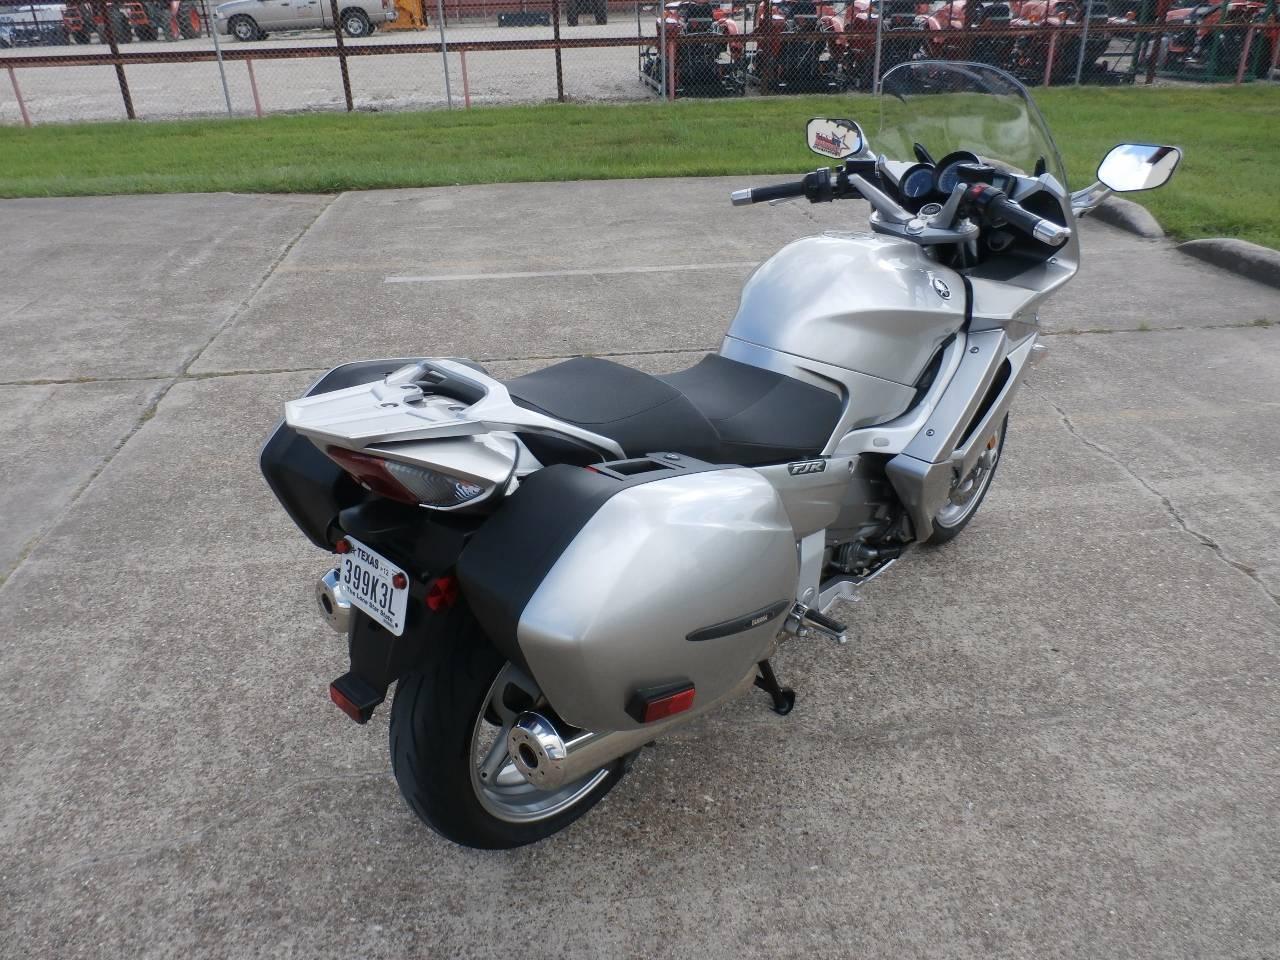 2011 Yamaha FJR1300A 3